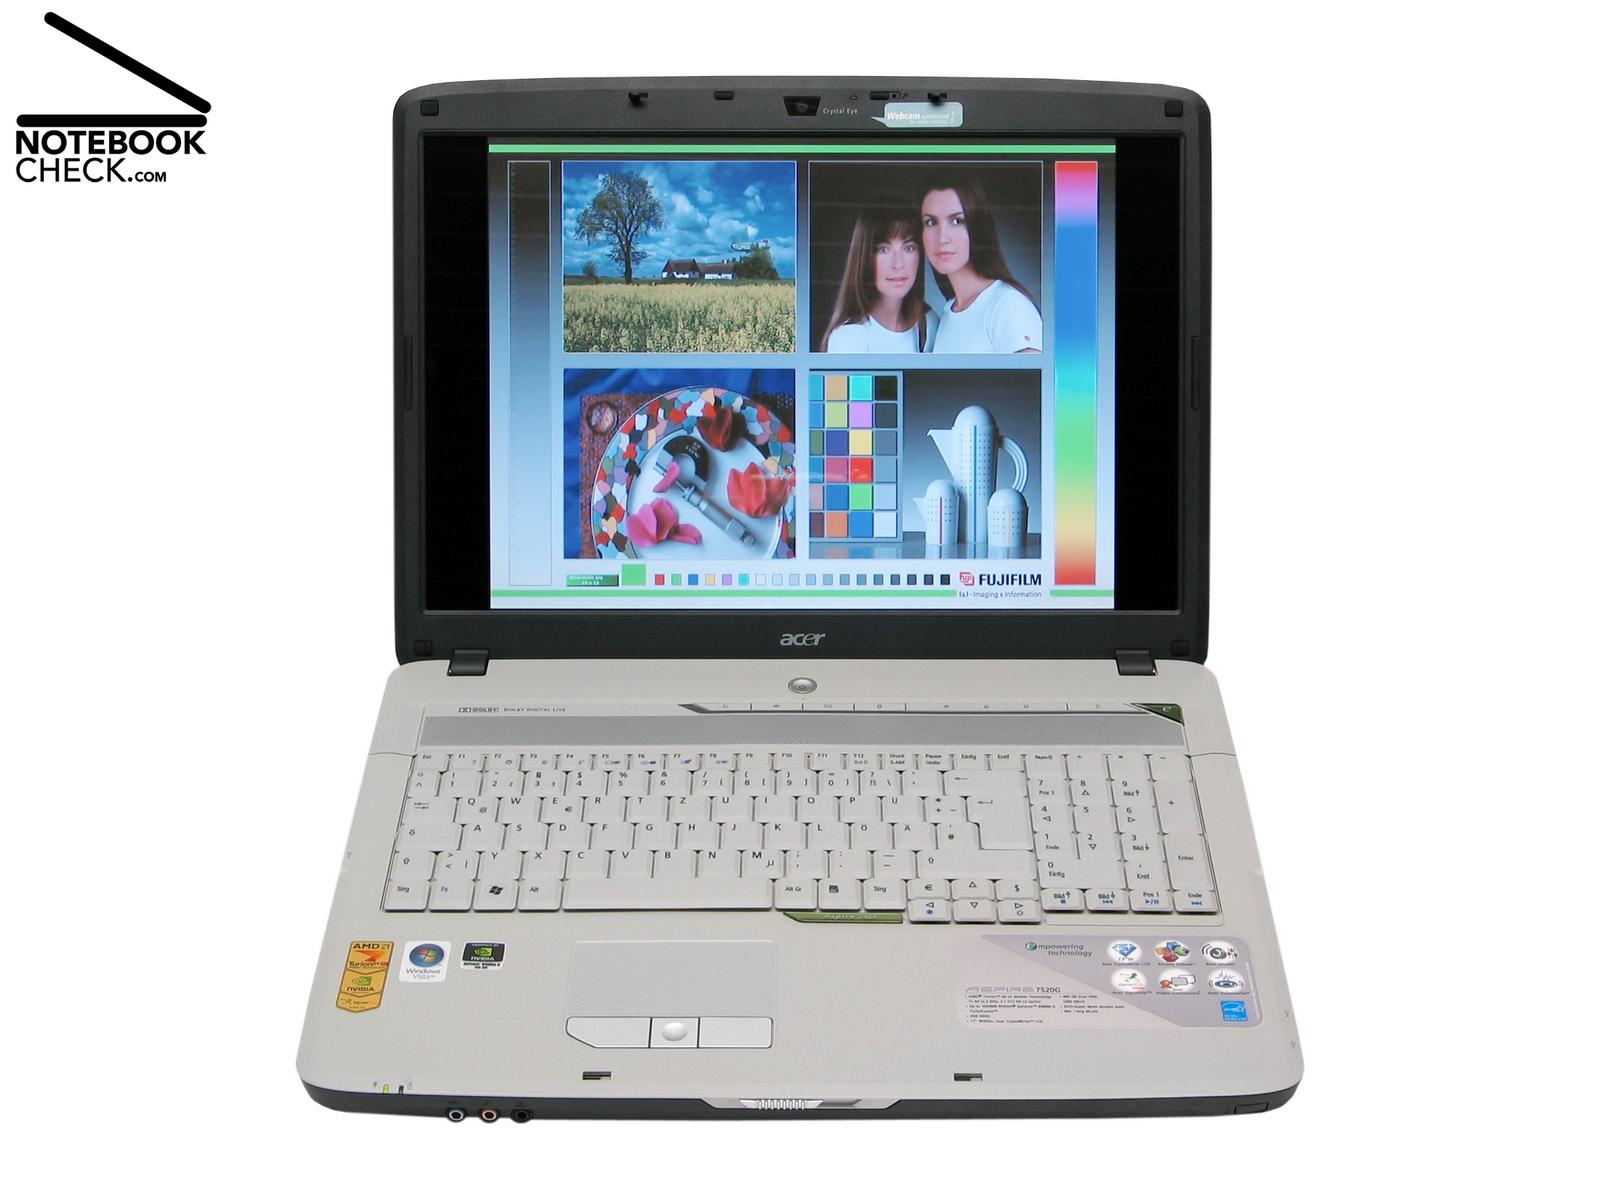 Testrapport Acer Aspire 7520G 602G40 Notebook